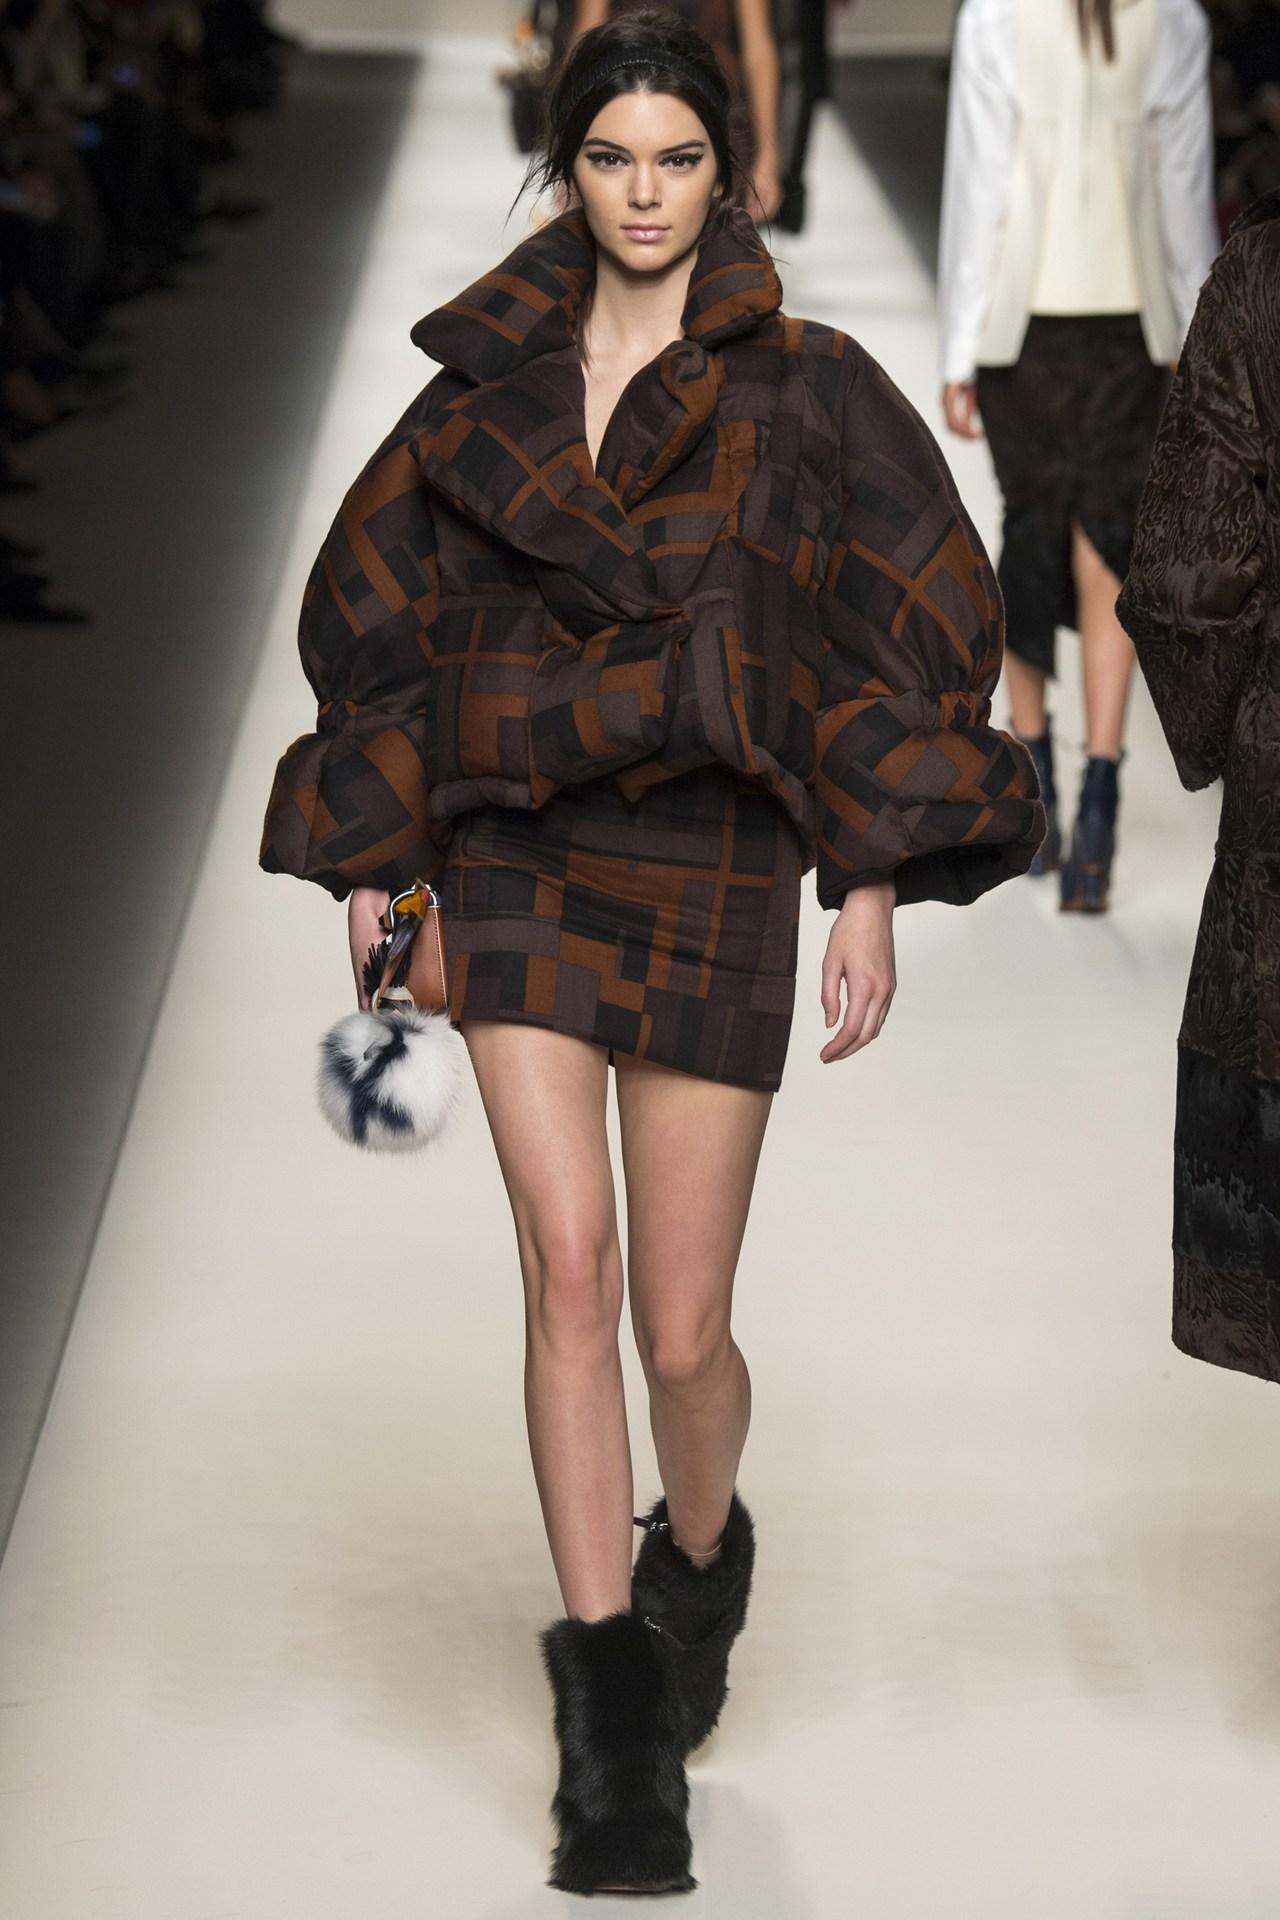 Foto de Kendall jenner en las Semanas de la Moda (10/17)